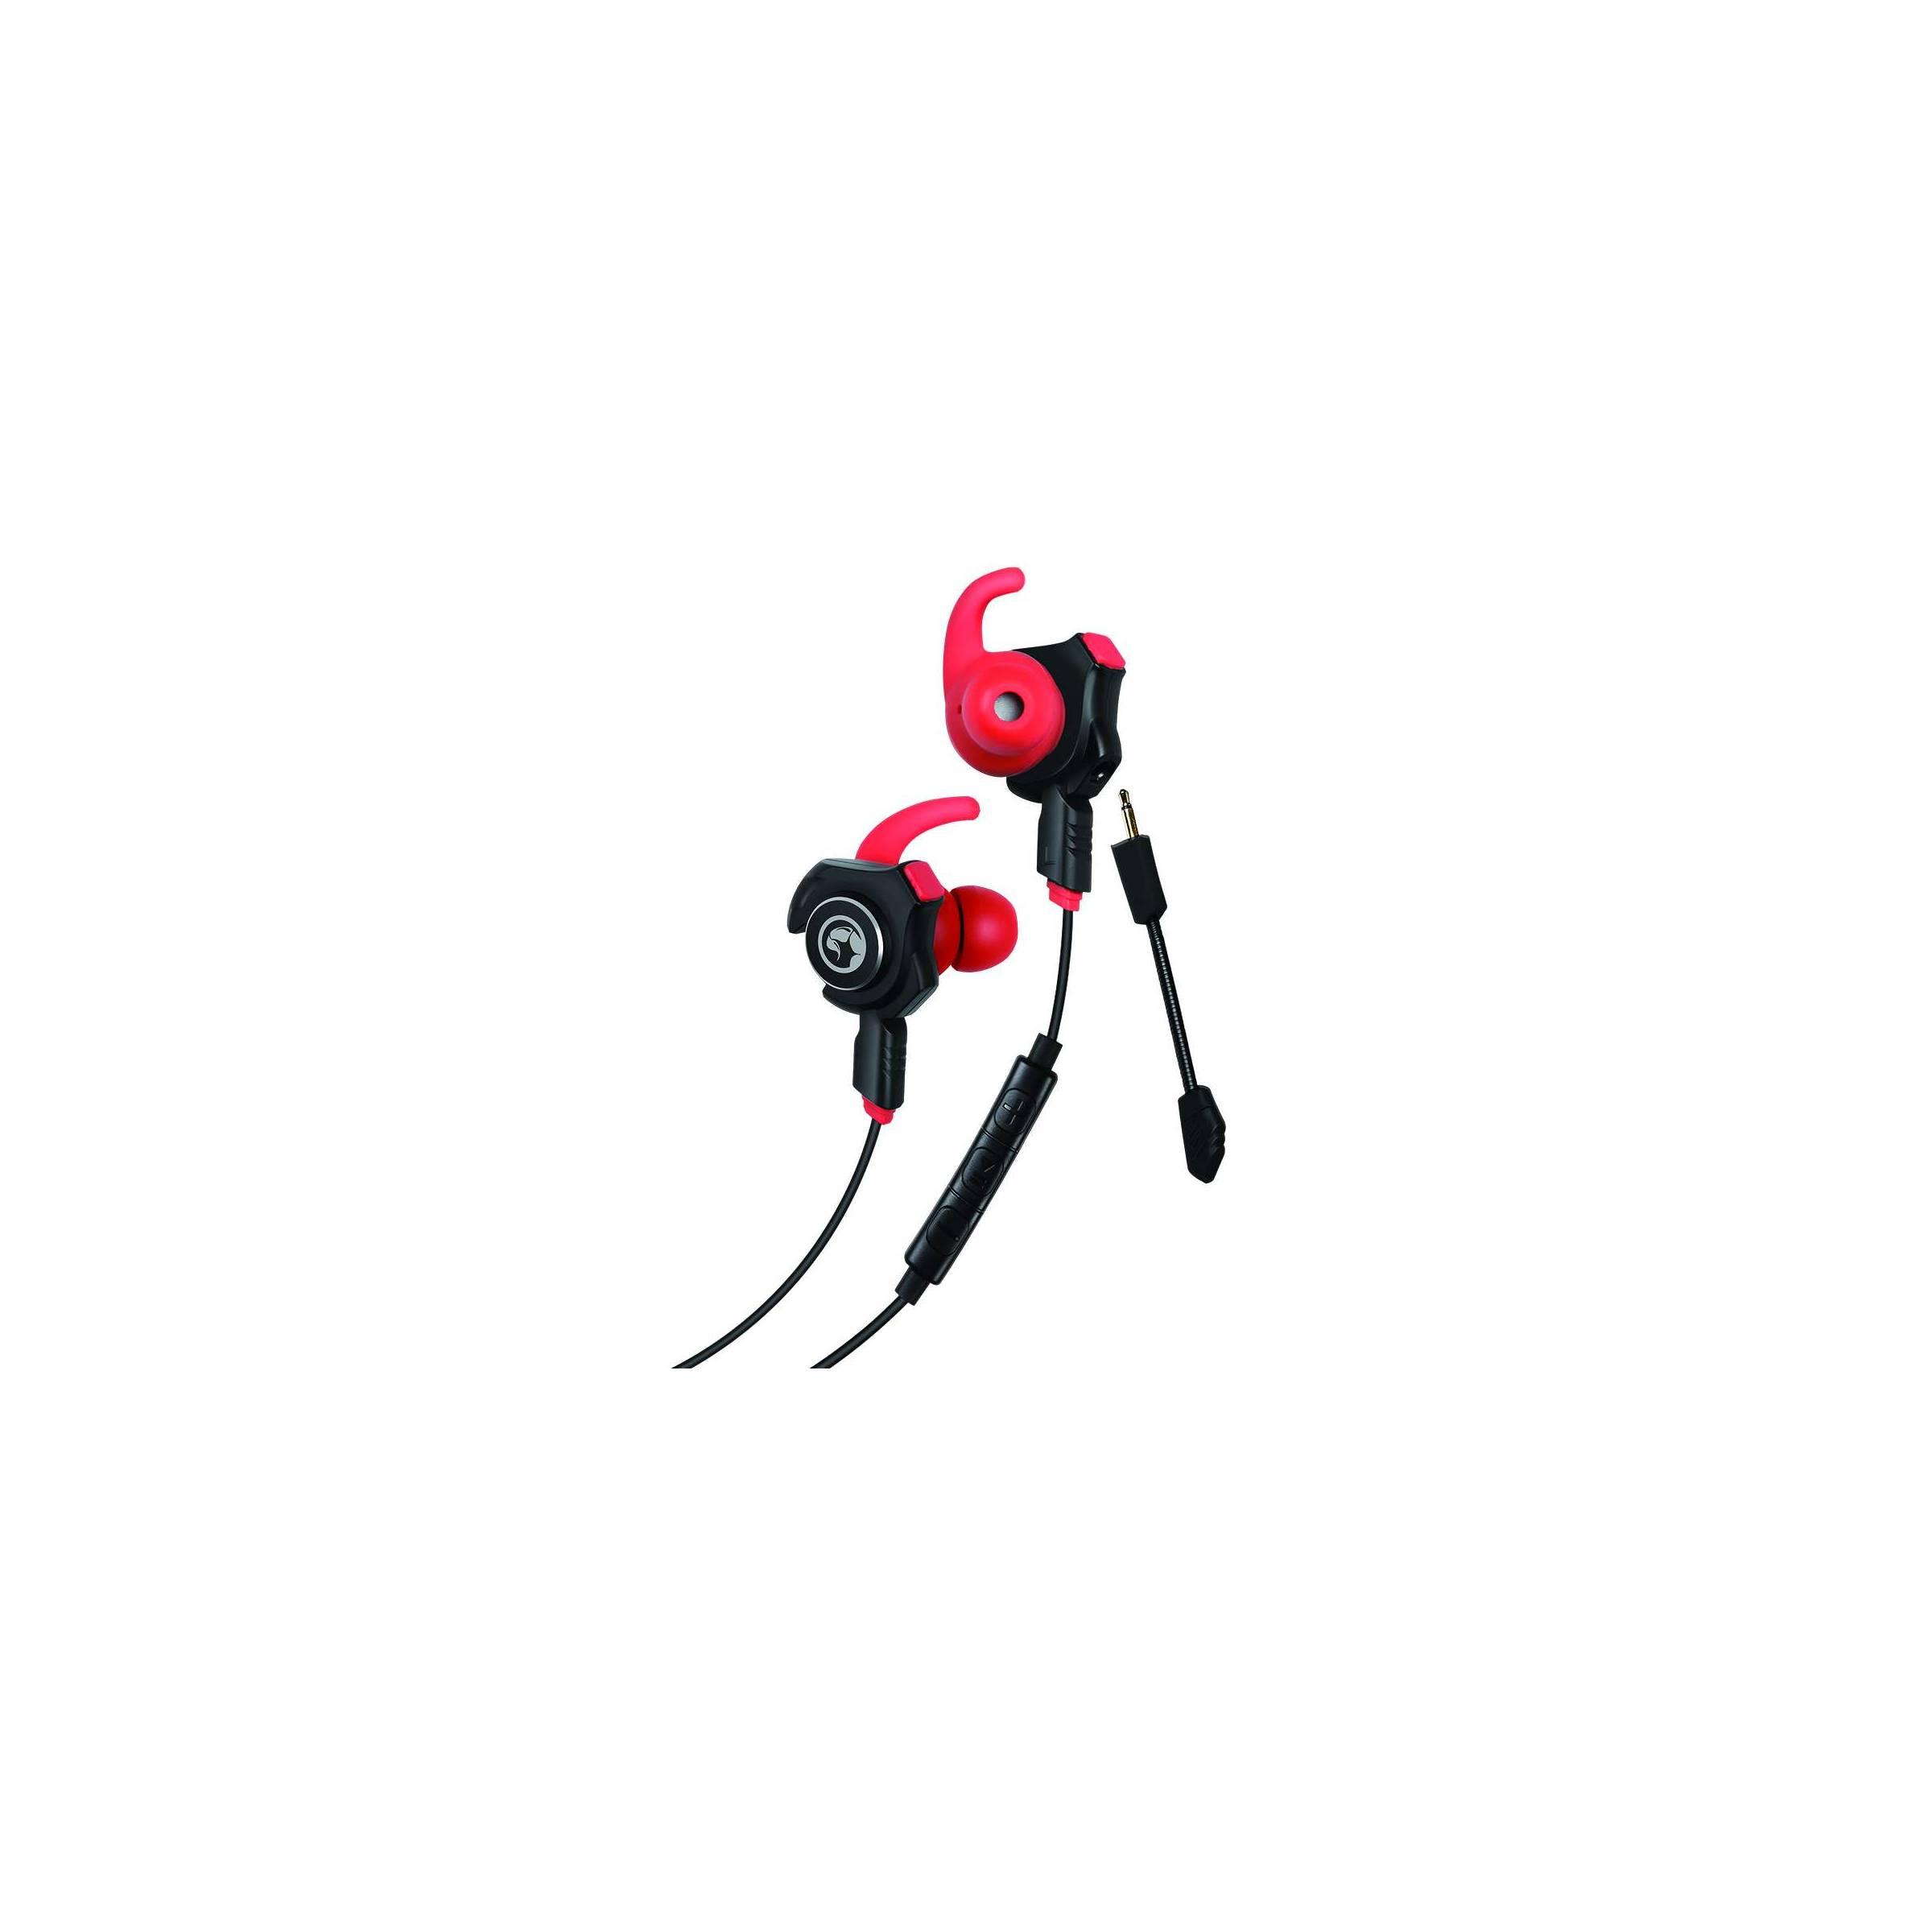 scorpion by marvo Marvo in-ear gaming headset gp001 på mackabler.dk